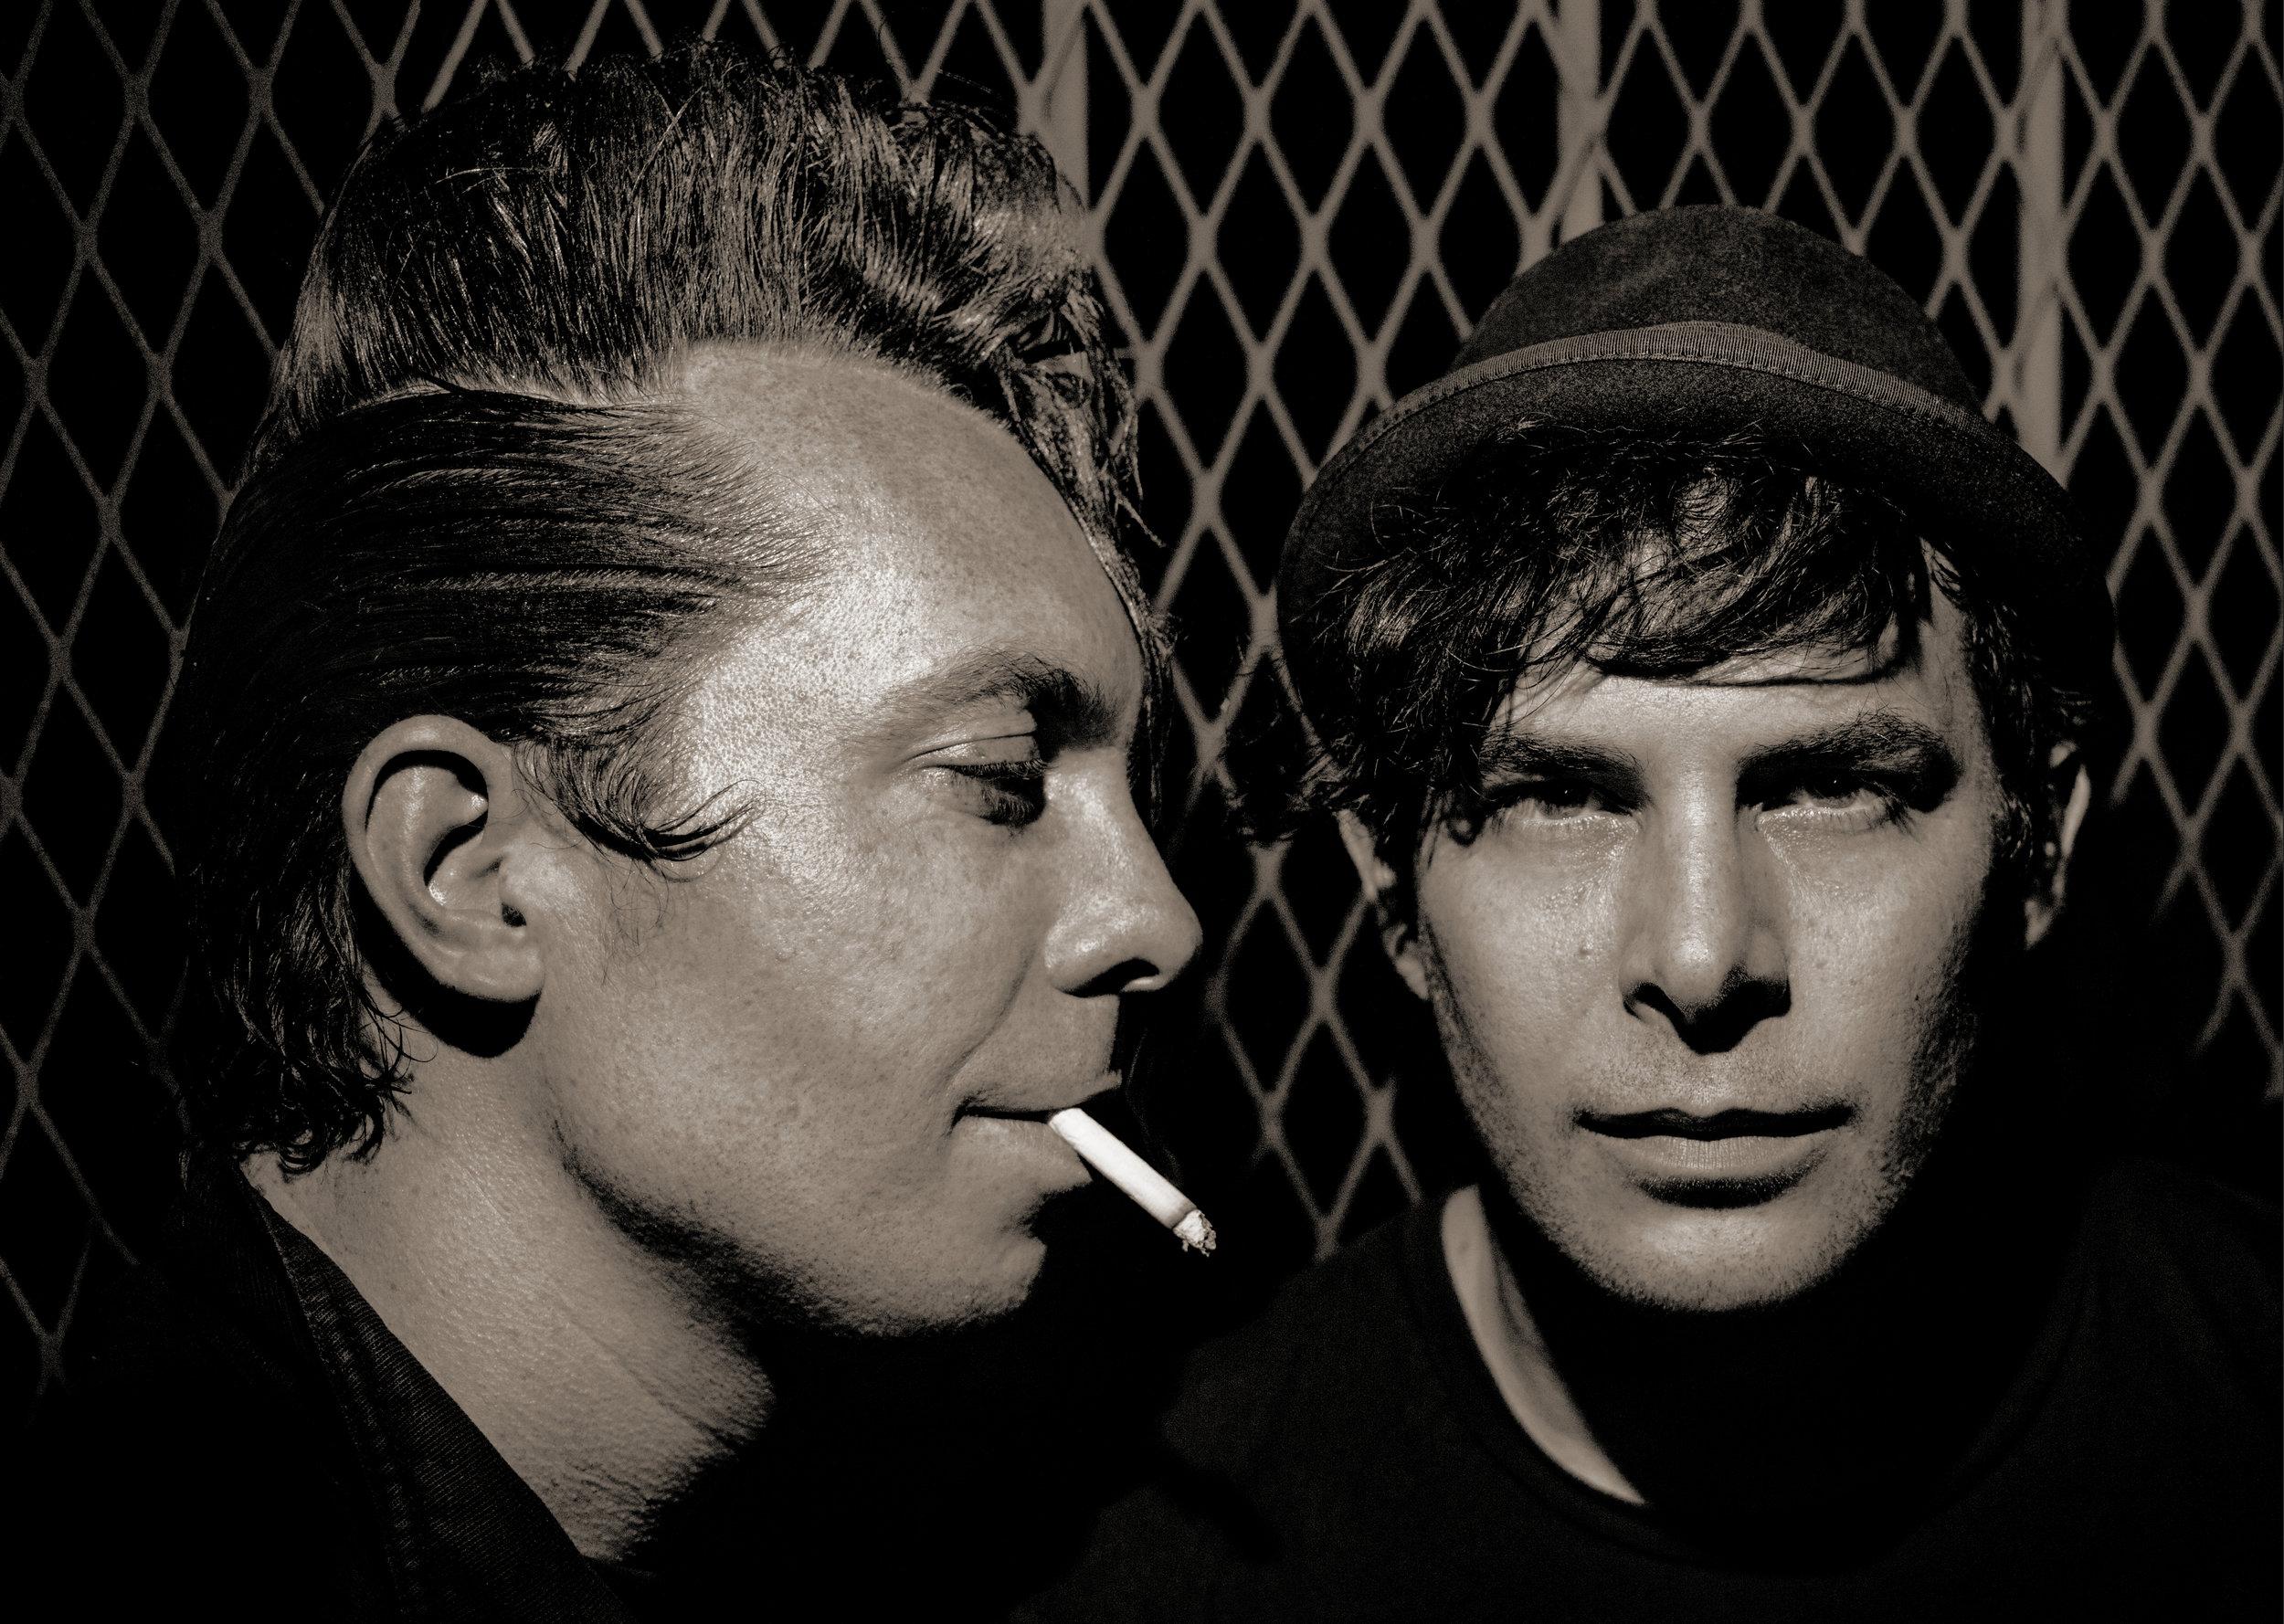 Photos of Los Angeles Rock Band Dead Day Revolution Taken By Photographer Rob Berezowski.See more of Dead Day Revolution at: http://deaddayrevolution.com/See more photos by Rob Berezowski at: http://www.berezowski.com/